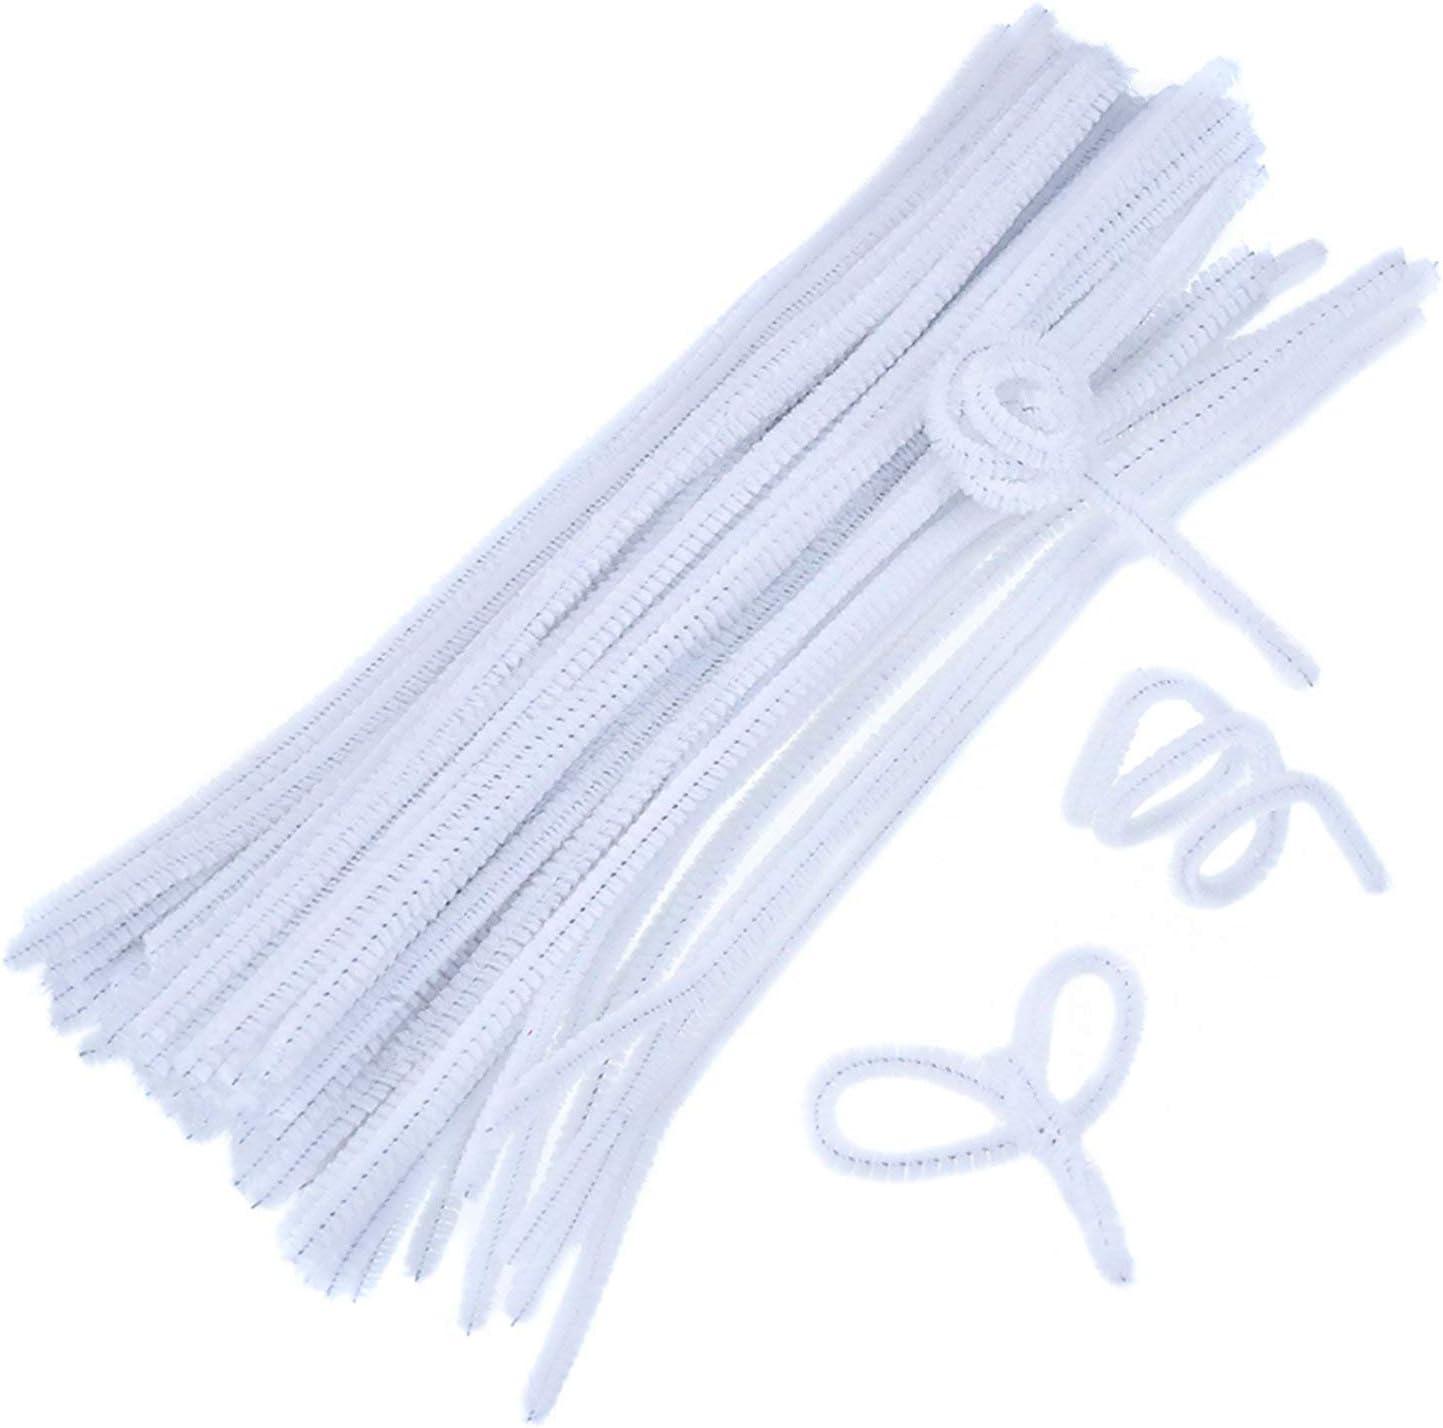 IVYRISE 200 Pieces White Chenille Stems Valentine Day Handmade Decoration for DIY Art Creative Crafts